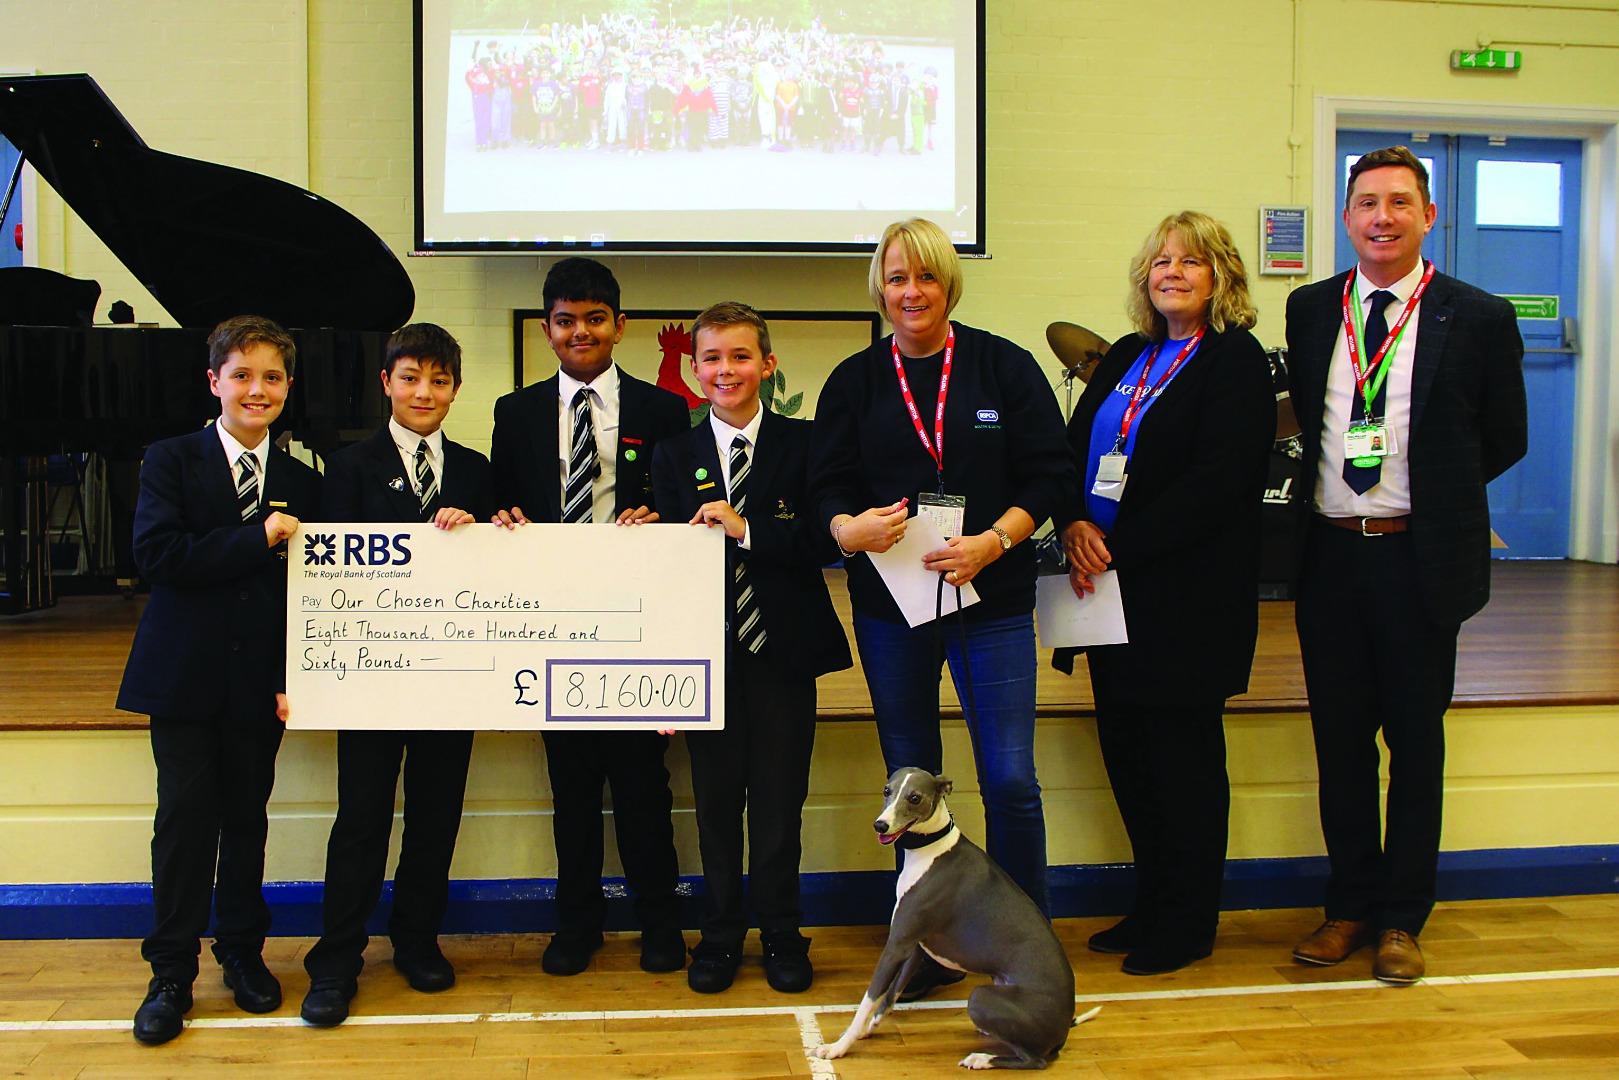 School donates £8000 to charities